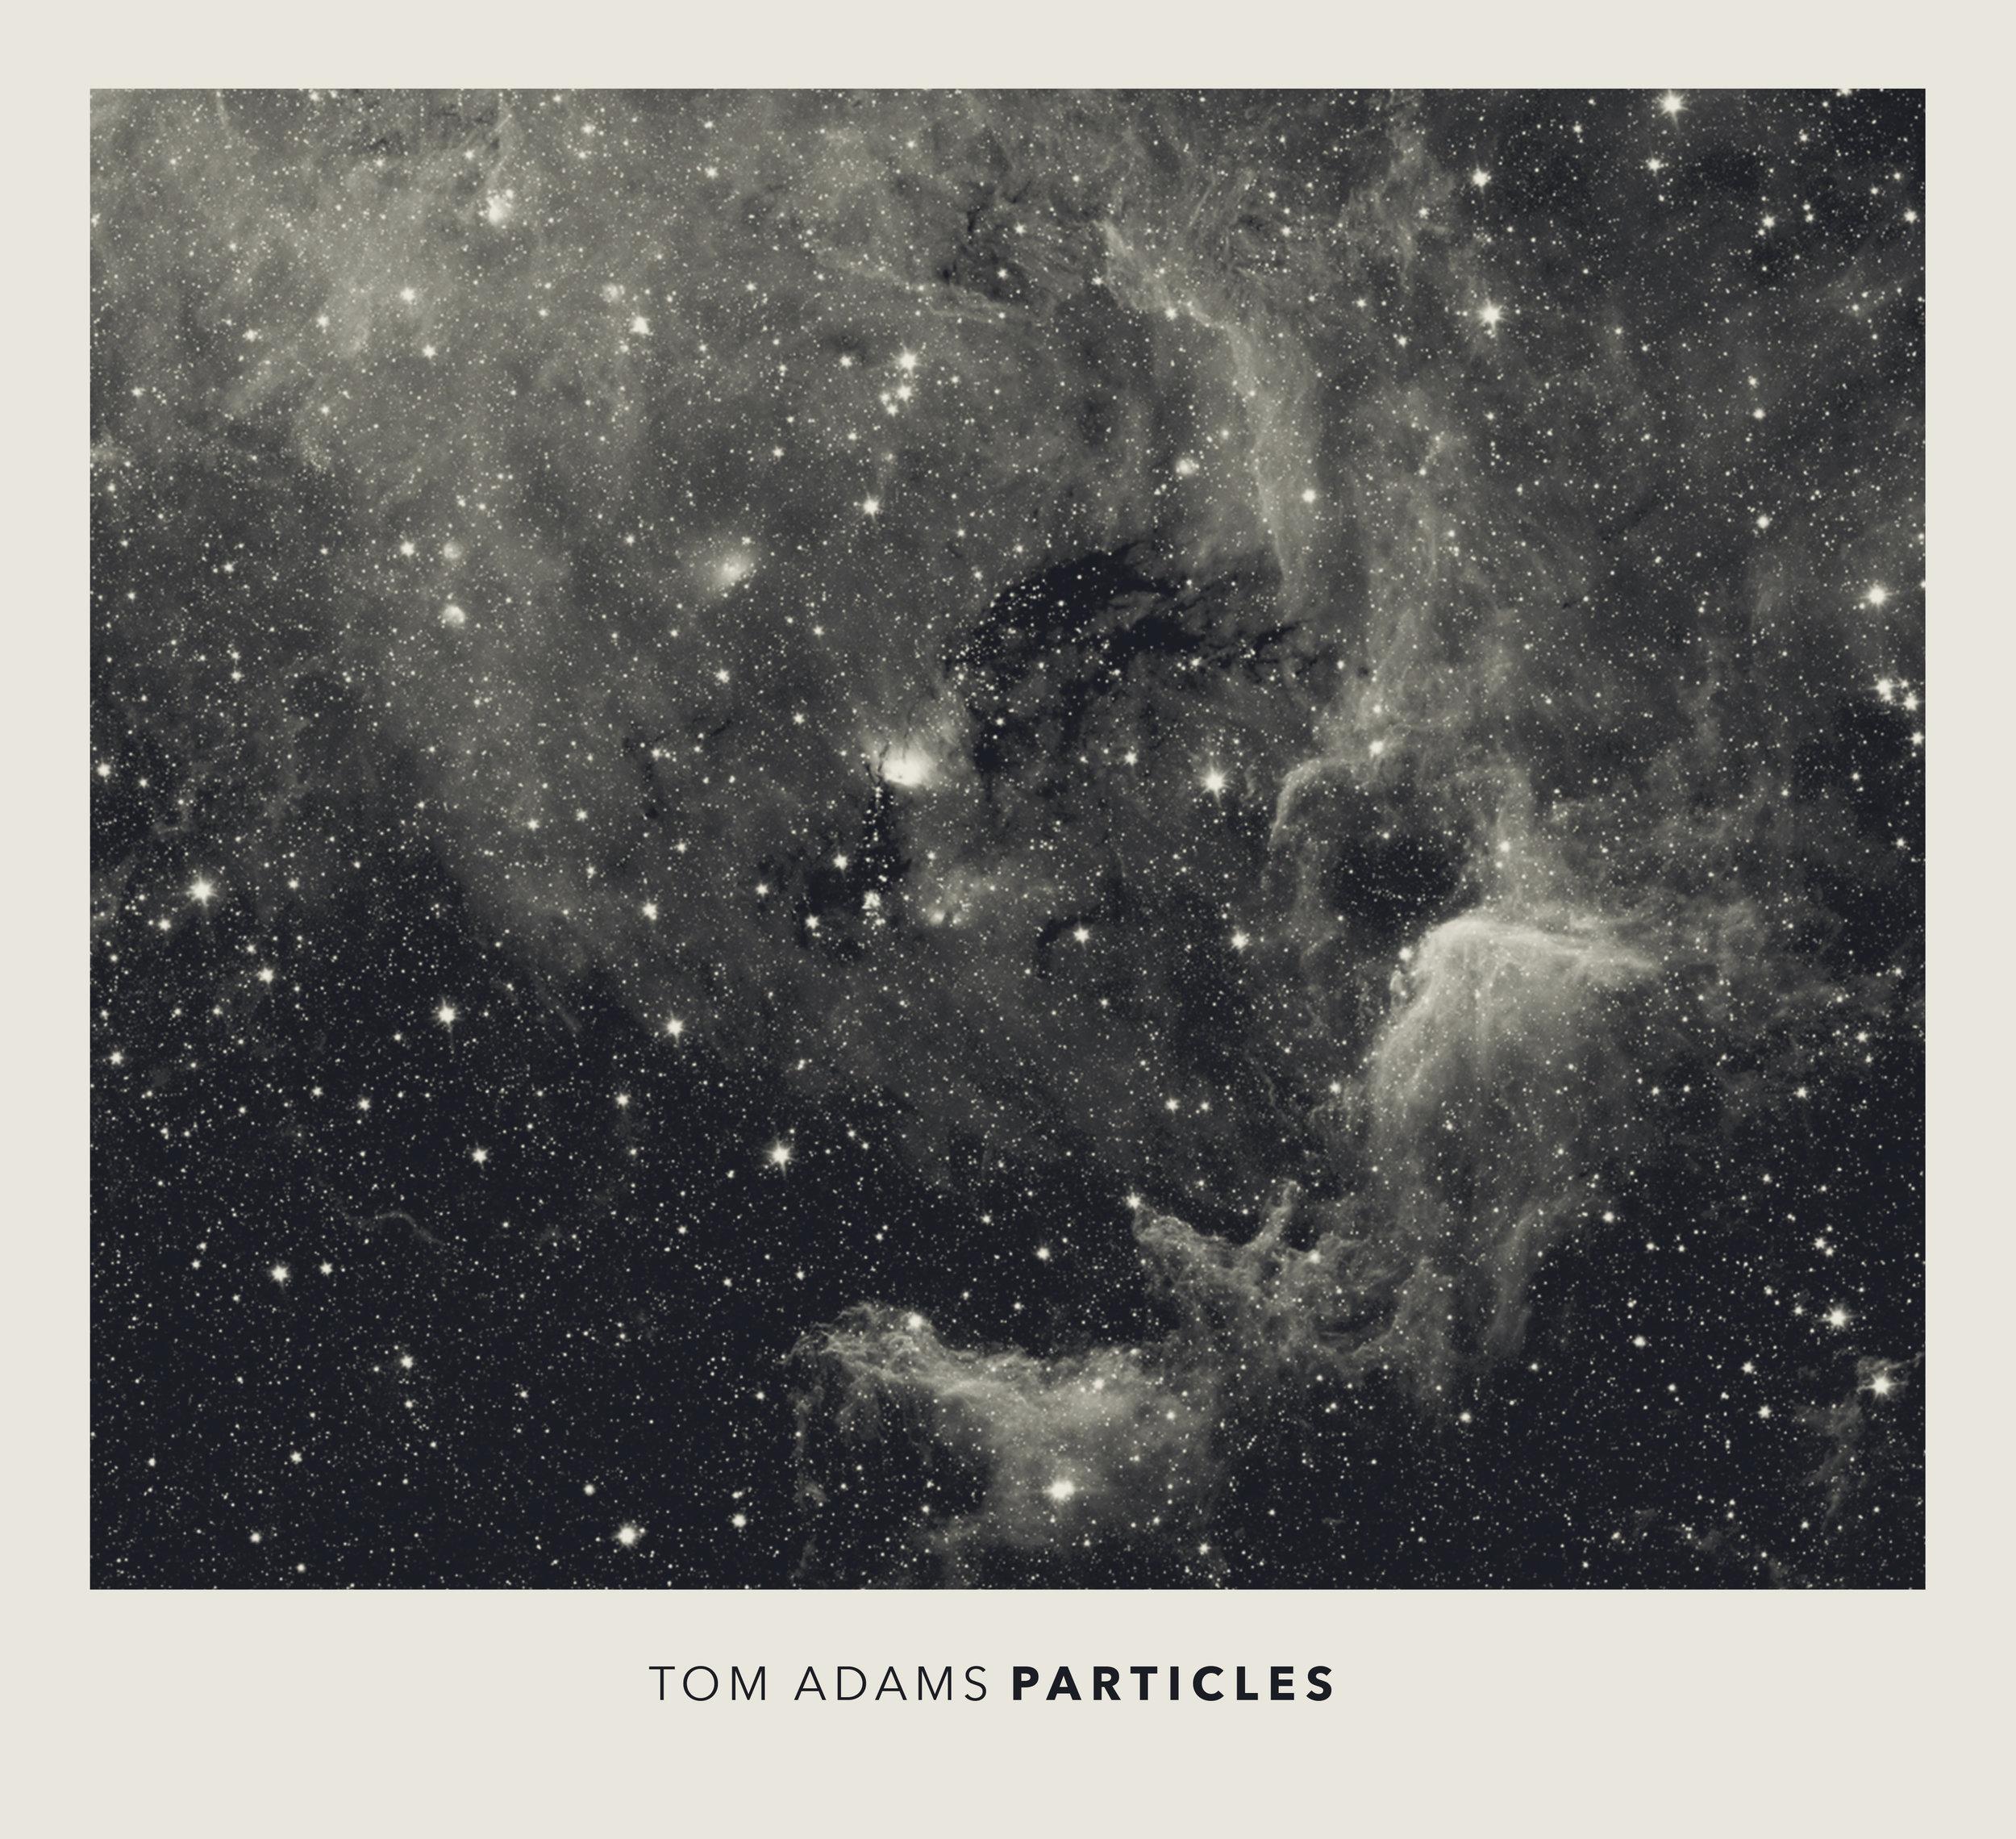 MR-TomAdams-Physical-Cover-.jpeg